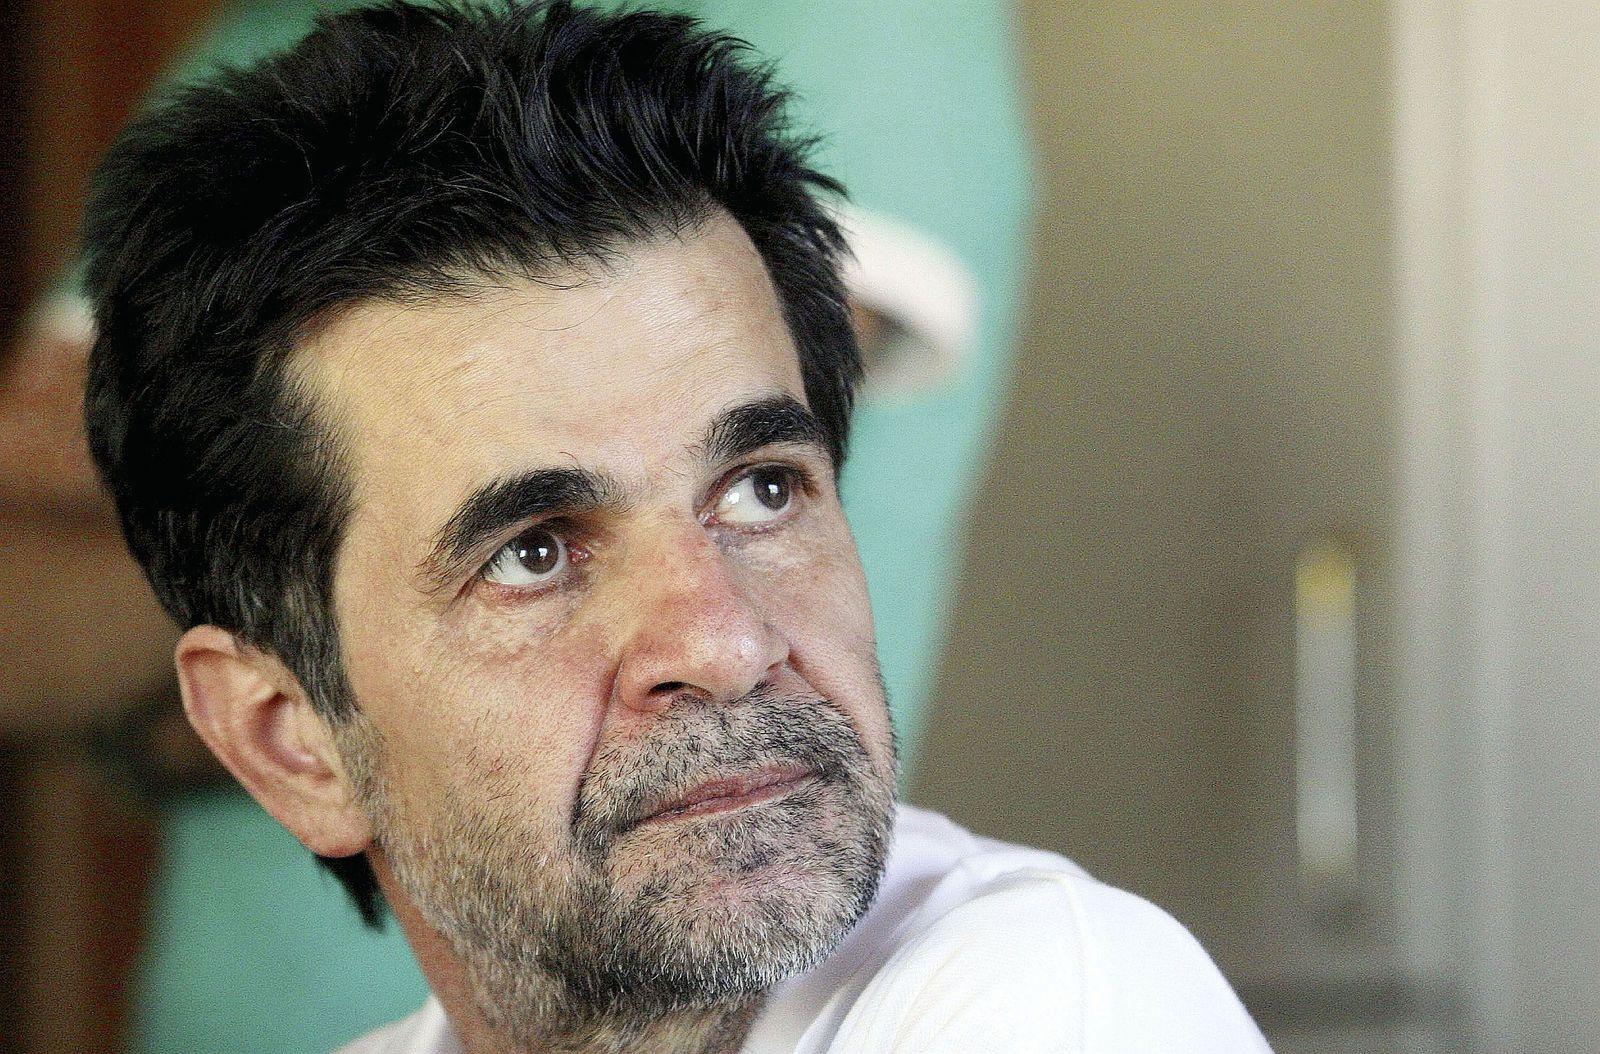 Jafar Panahi behält Platz in Berlinale-Jury